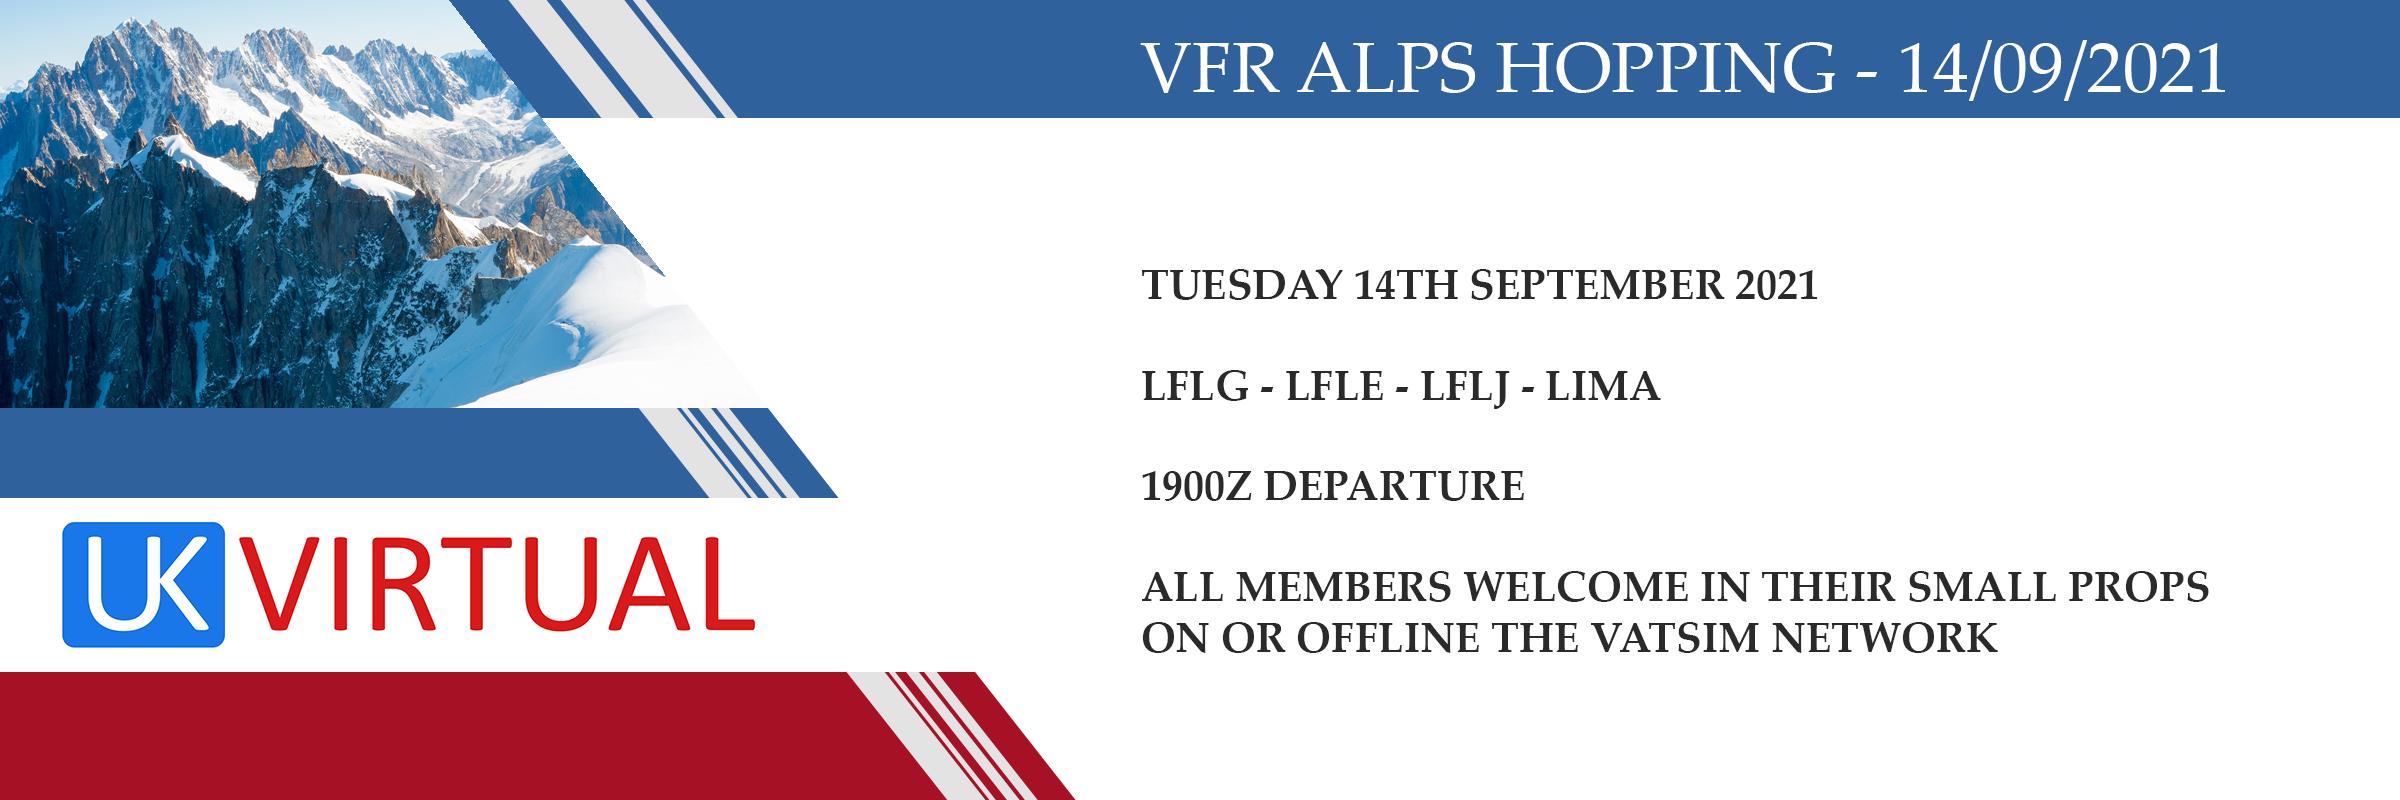 New Group Flight – 14/09/2021 19:00